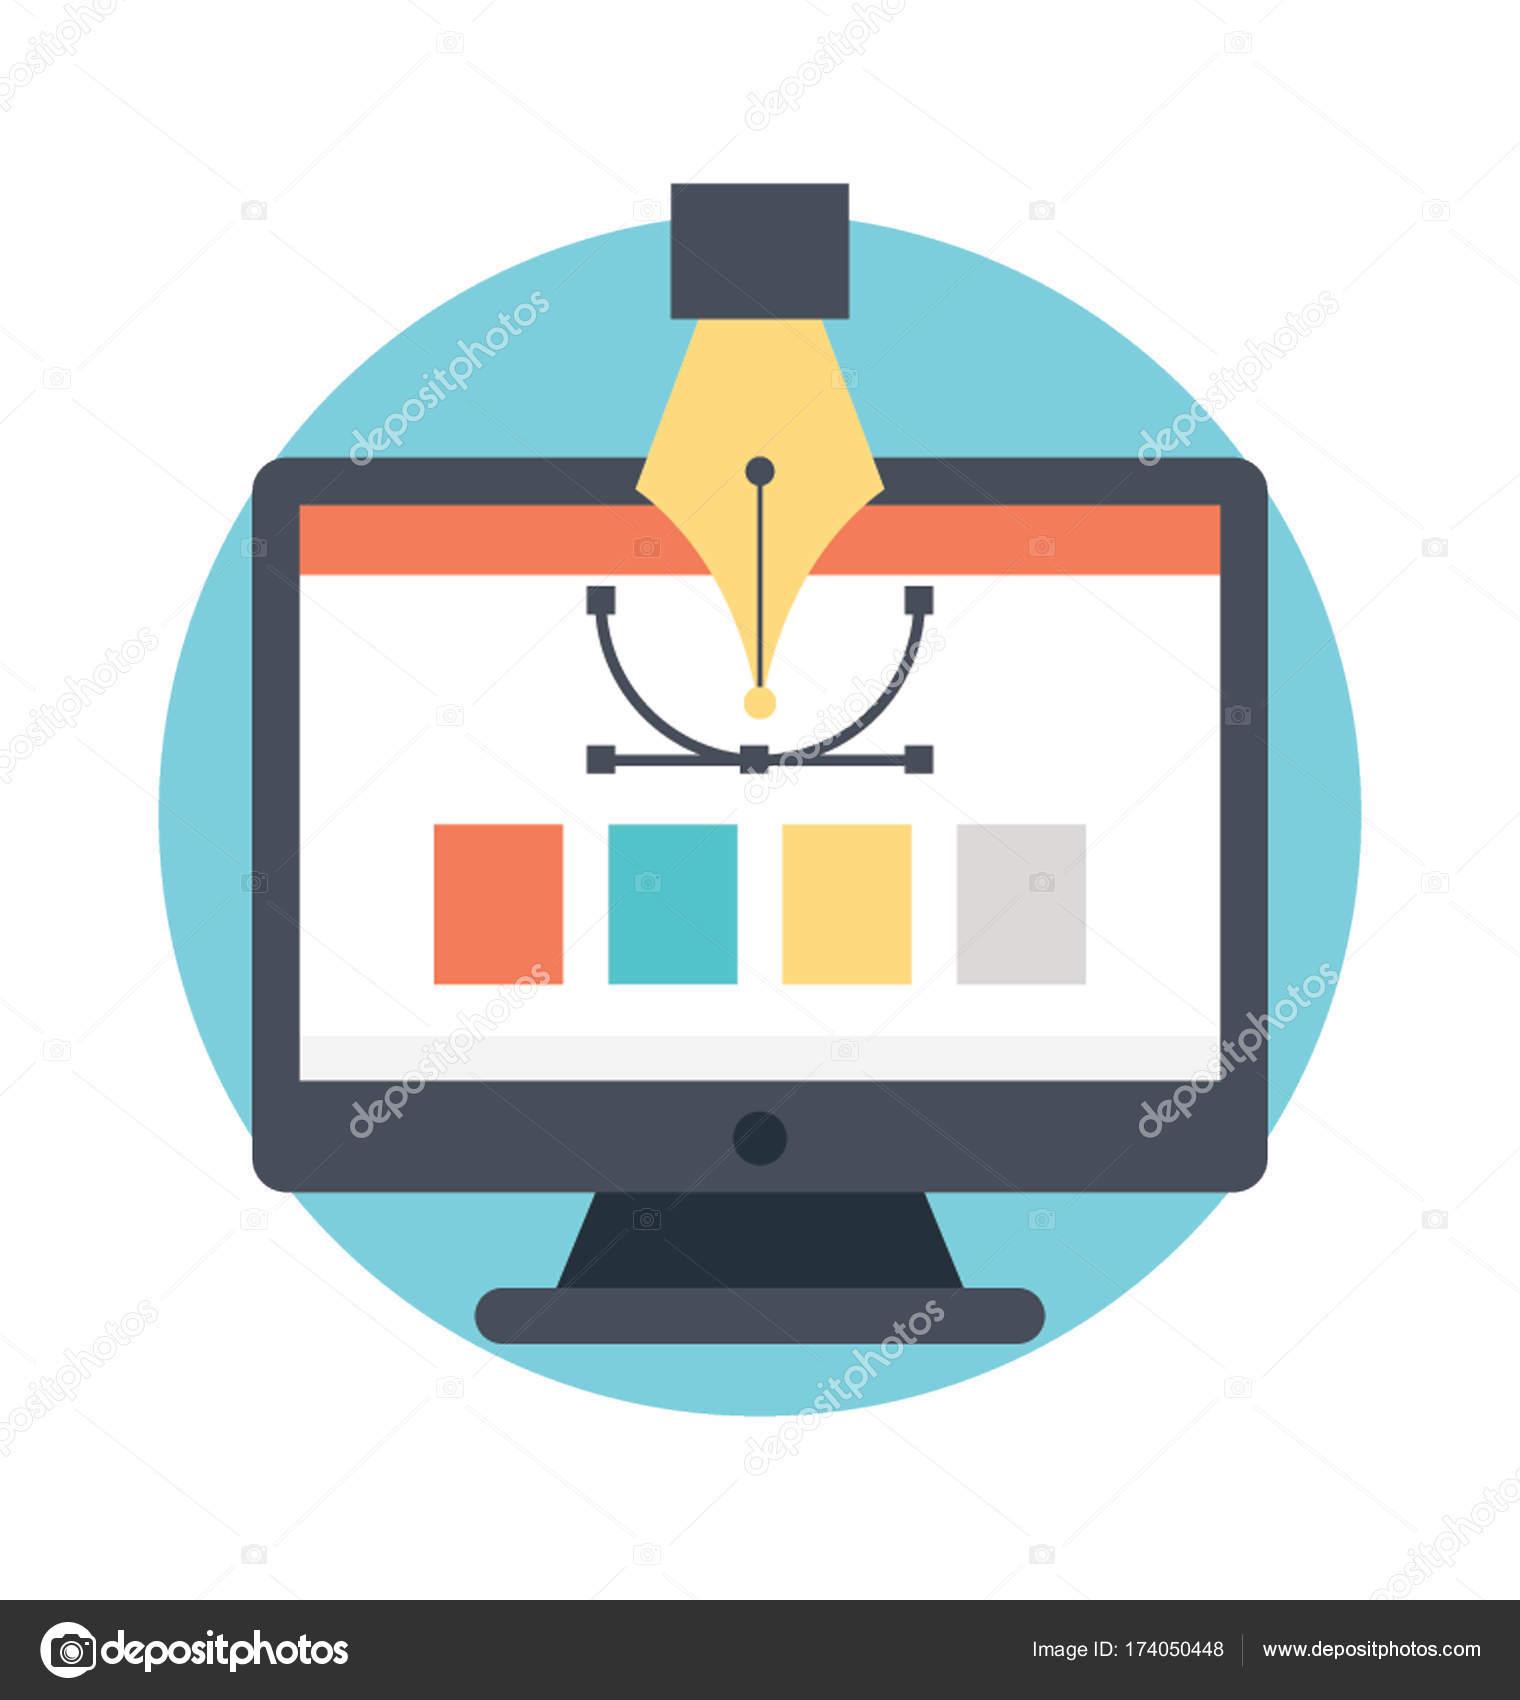 Web Design Flat Icon Stock Vector C Prosymbols 174050448